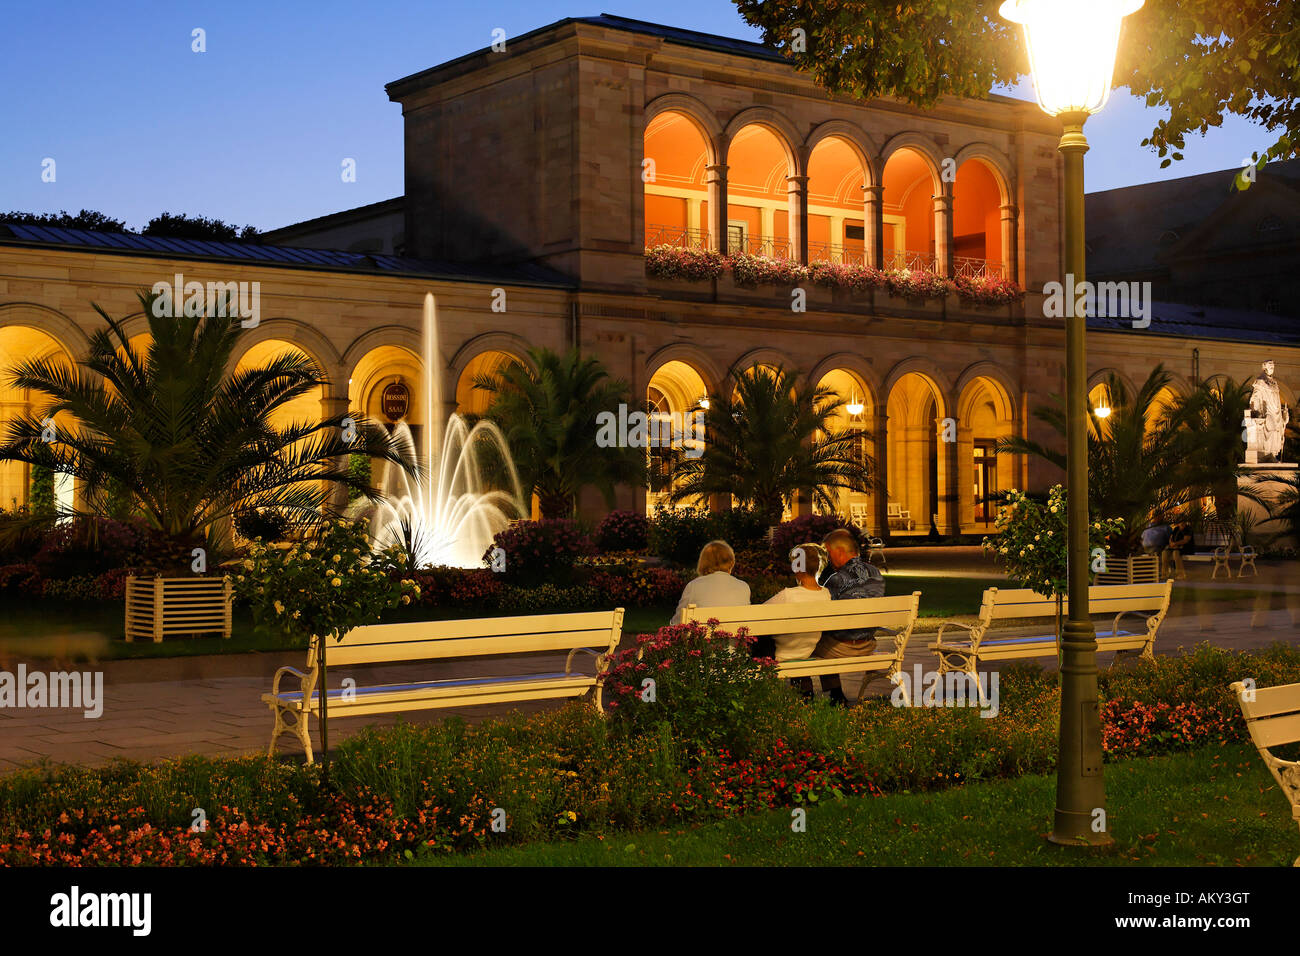 Arcades, Bad Kissingen, Rhoen, Franconia, Bavaria, Germany Stock Photo